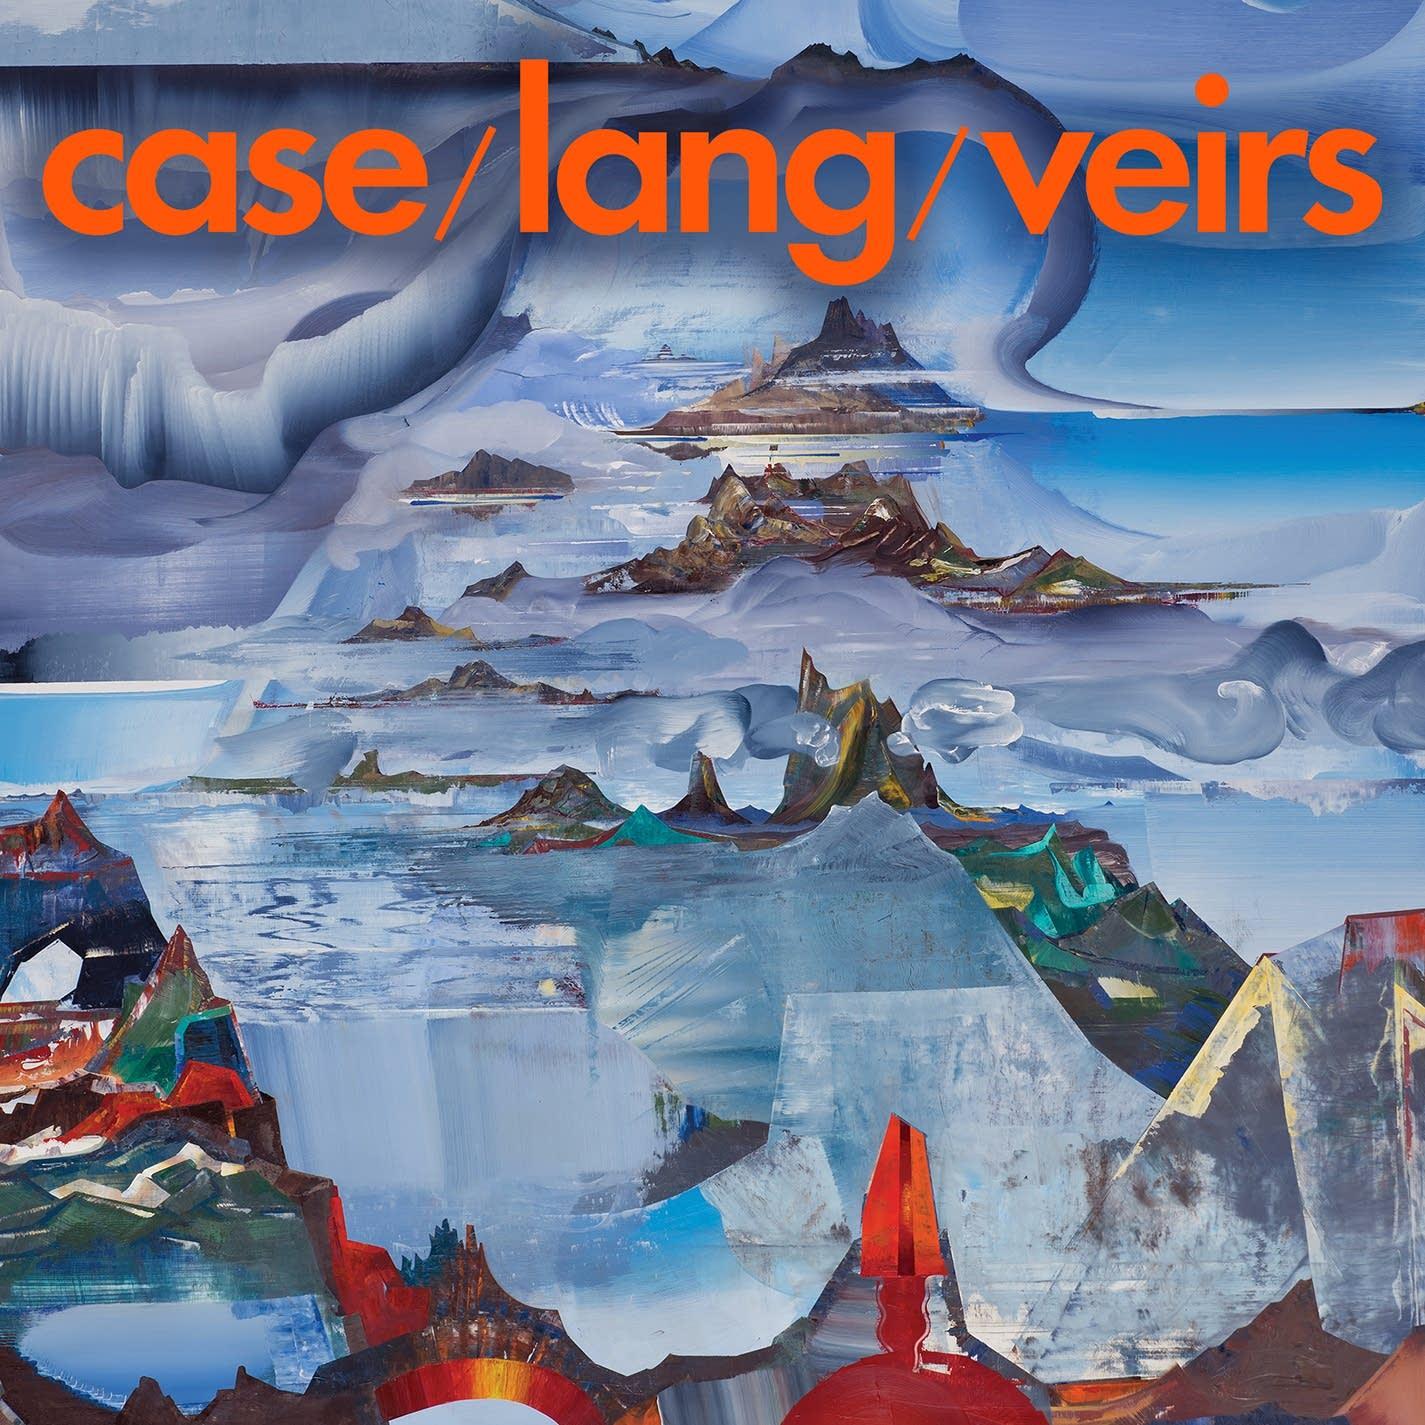 case lang veirs, 'case lang veirs'